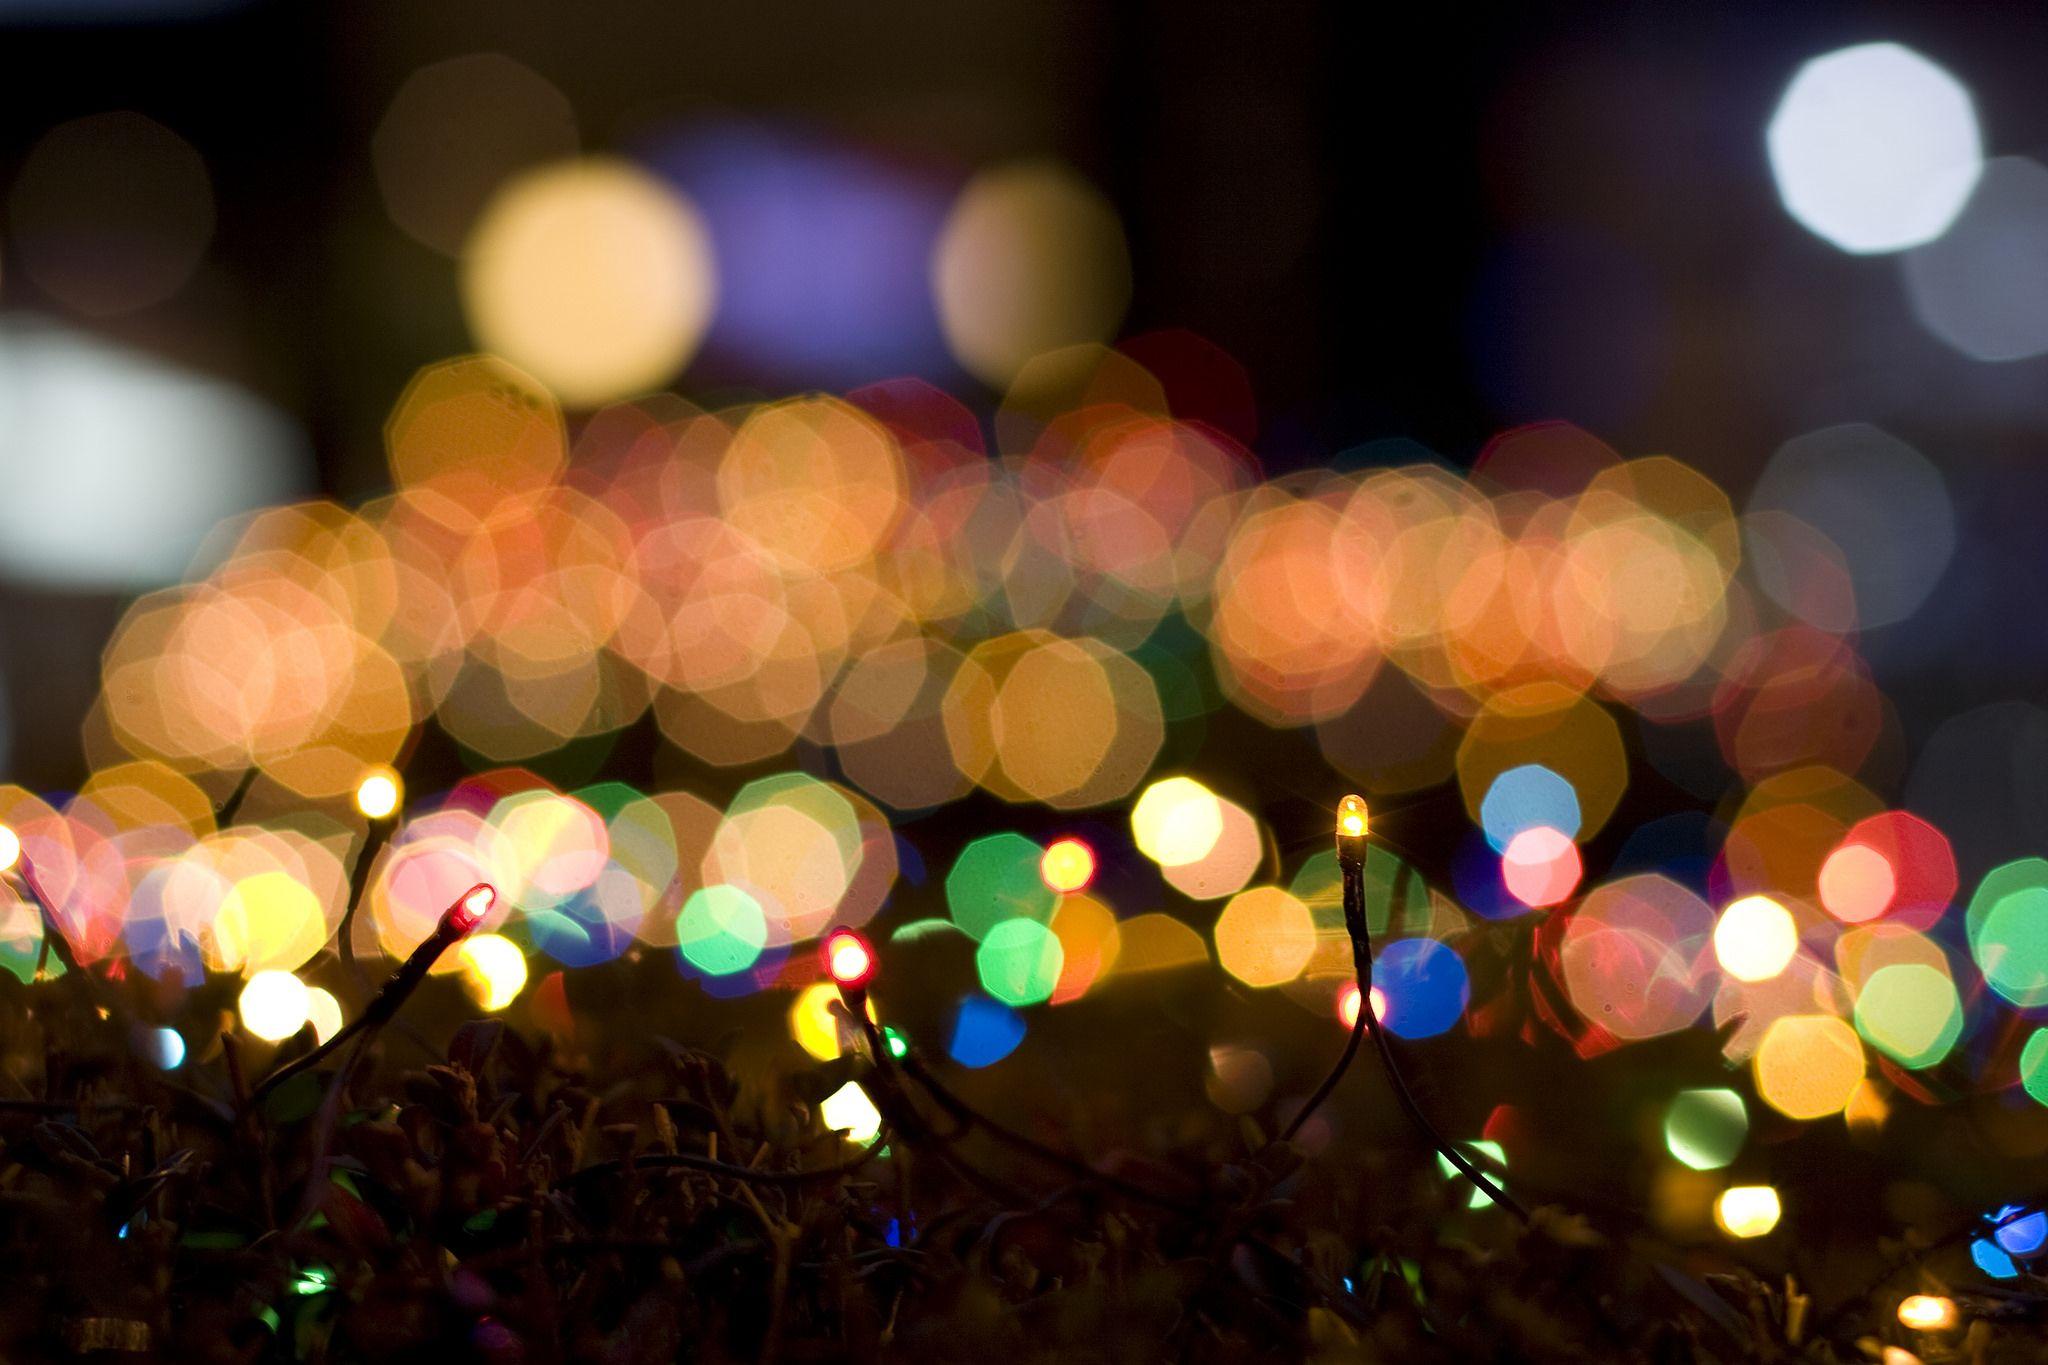 https://flic.kr/p/qKm5TU | 빛과 함께하는 즐거움 : Light and fun together | 작지만 소중한 느낌을 전달해줍니다.